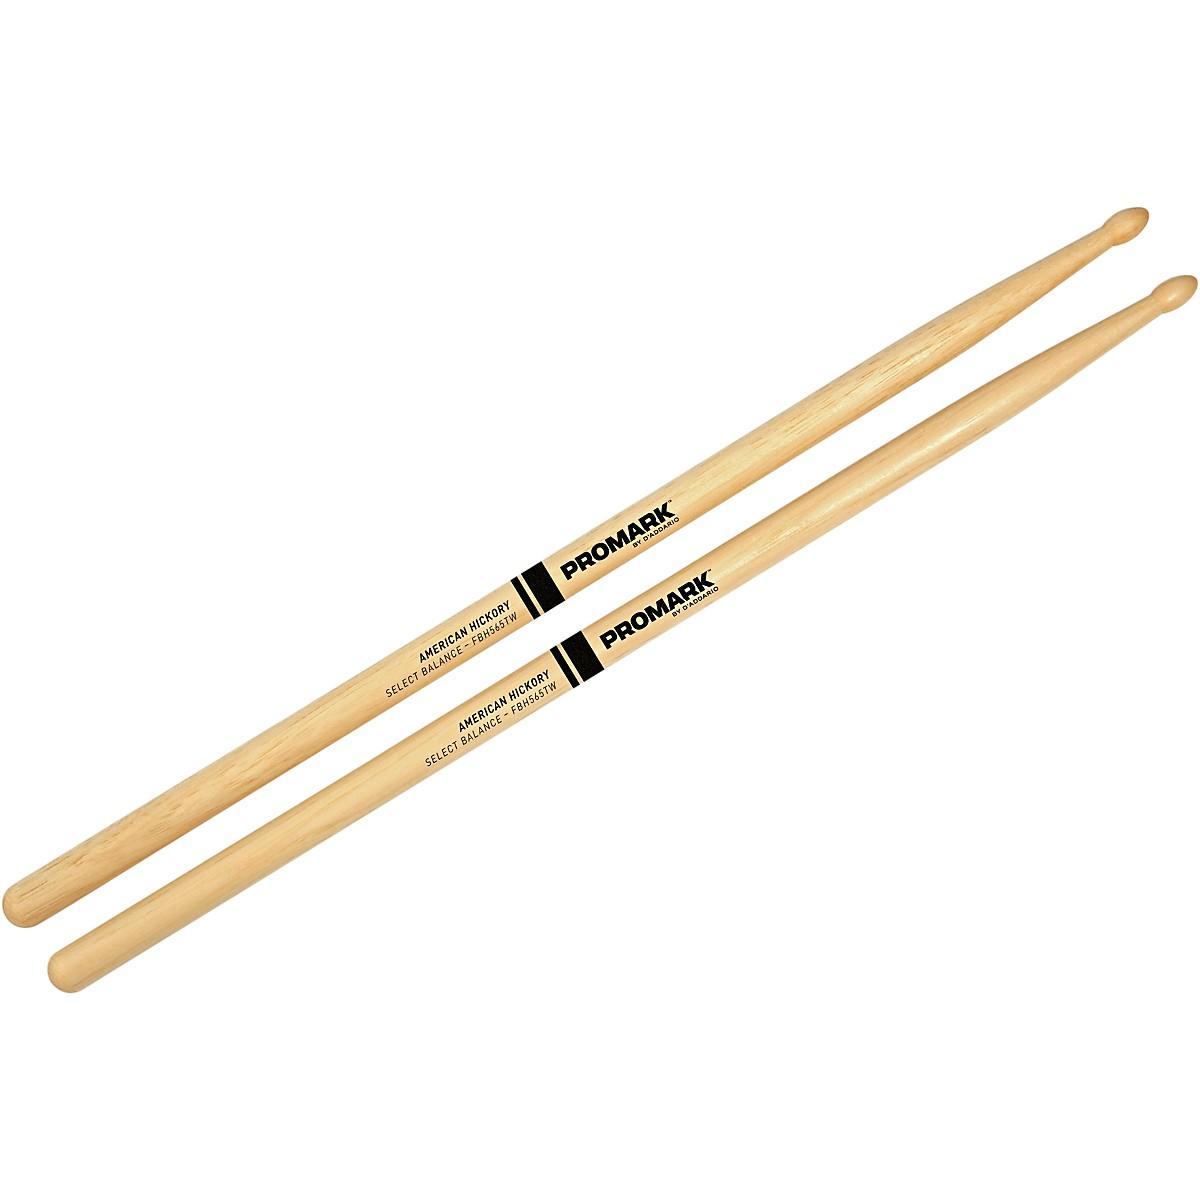 Promark Select Balance Forward Balance Wood Tip Drumsticks